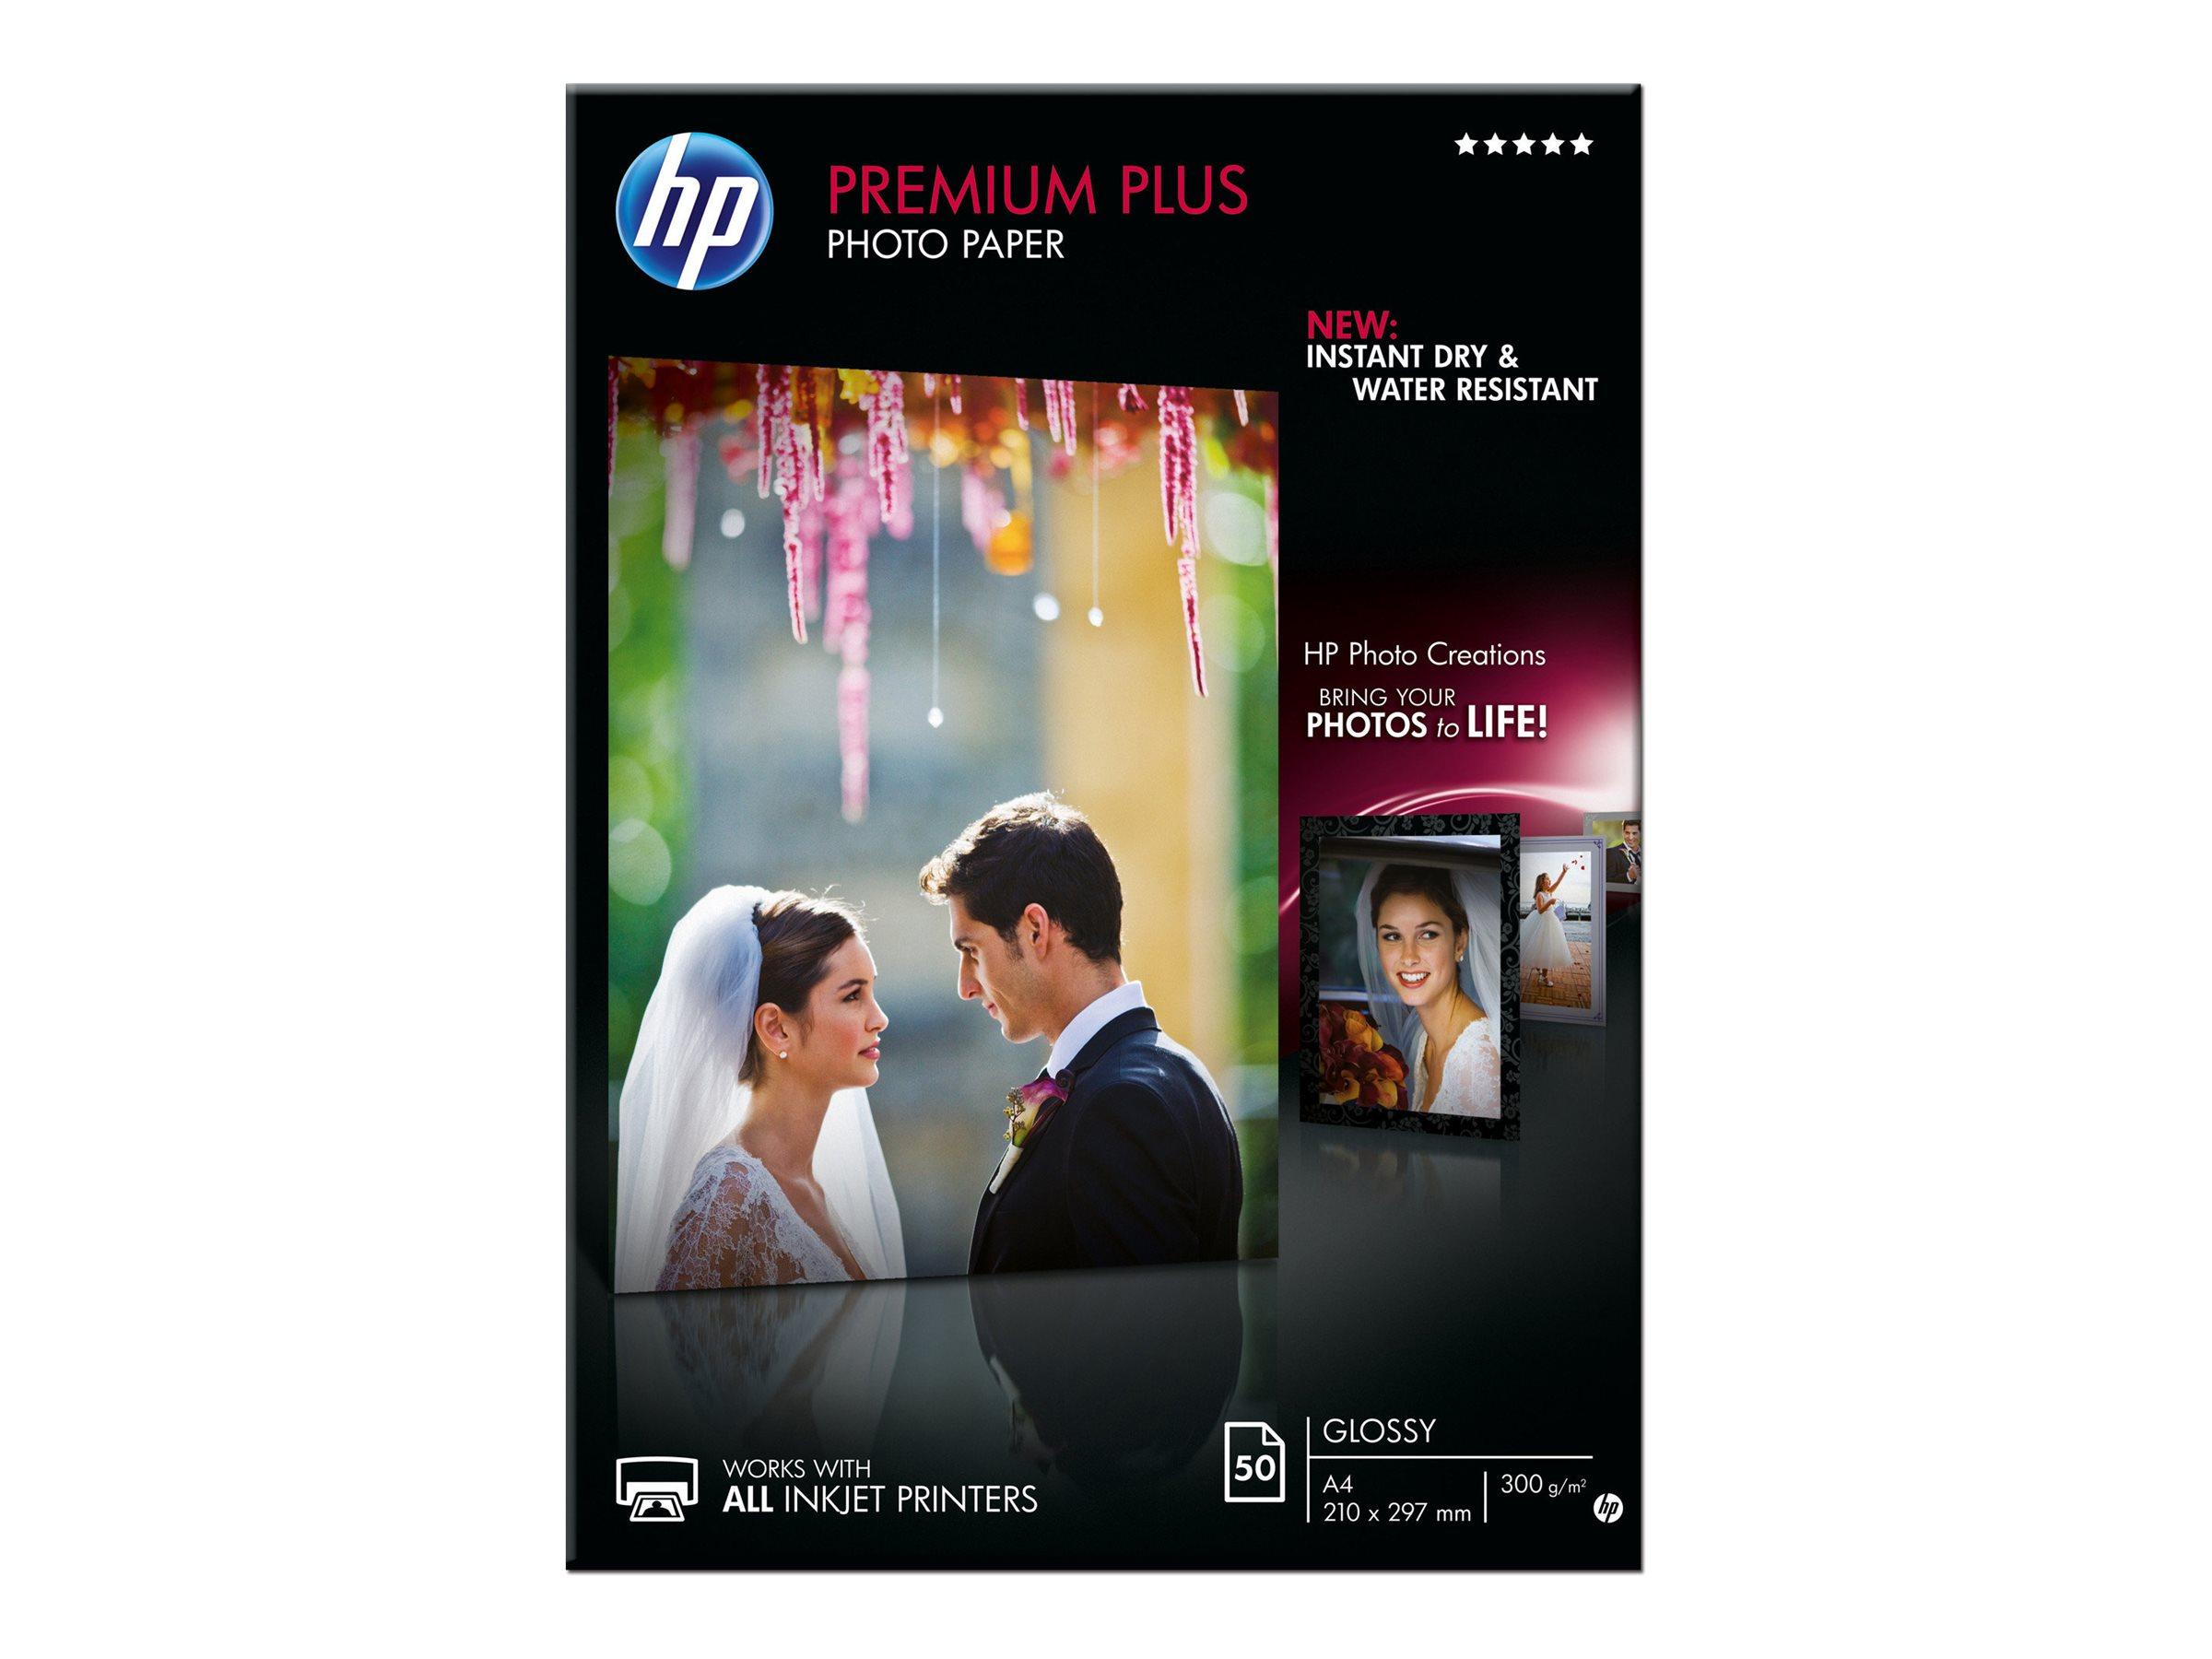 HP Premium Plus Photo Paper - Glänzend - A4 (210 x 297 mm) - 300 g/m² - 50 Blatt Fotopapier - für Envy 50XX, 7645; Officejet 52X